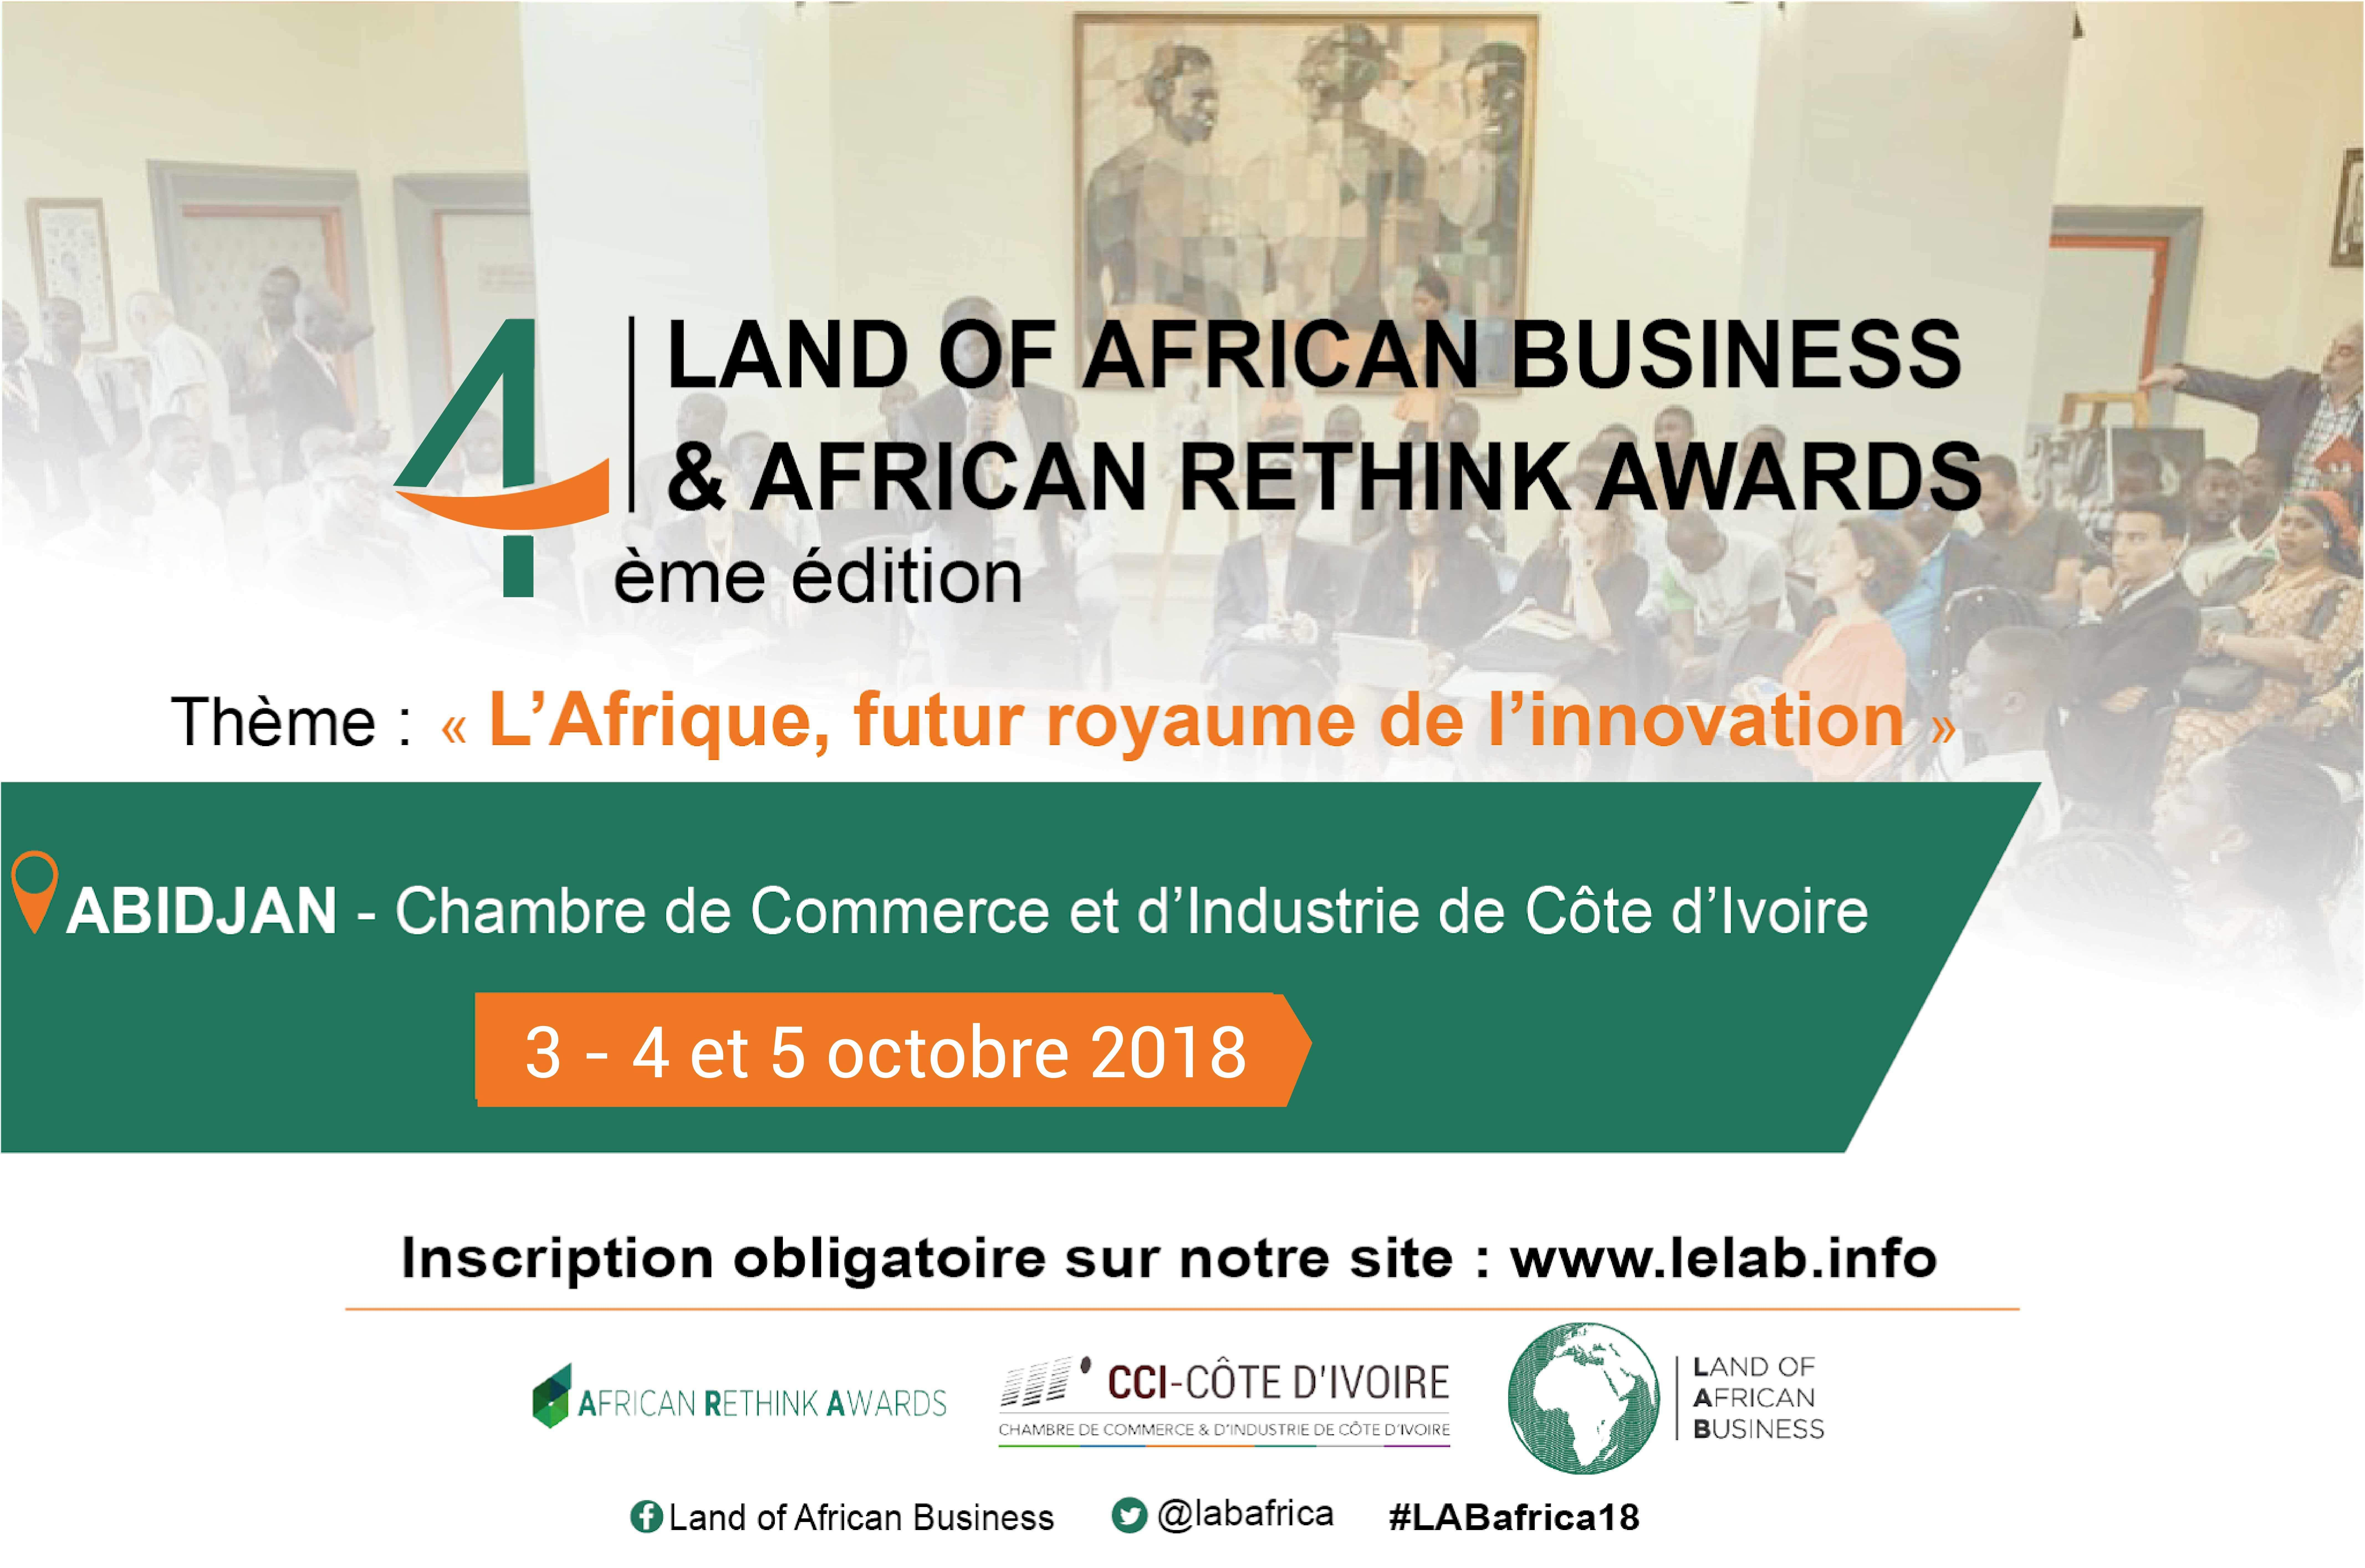 Programme du Land of African Business